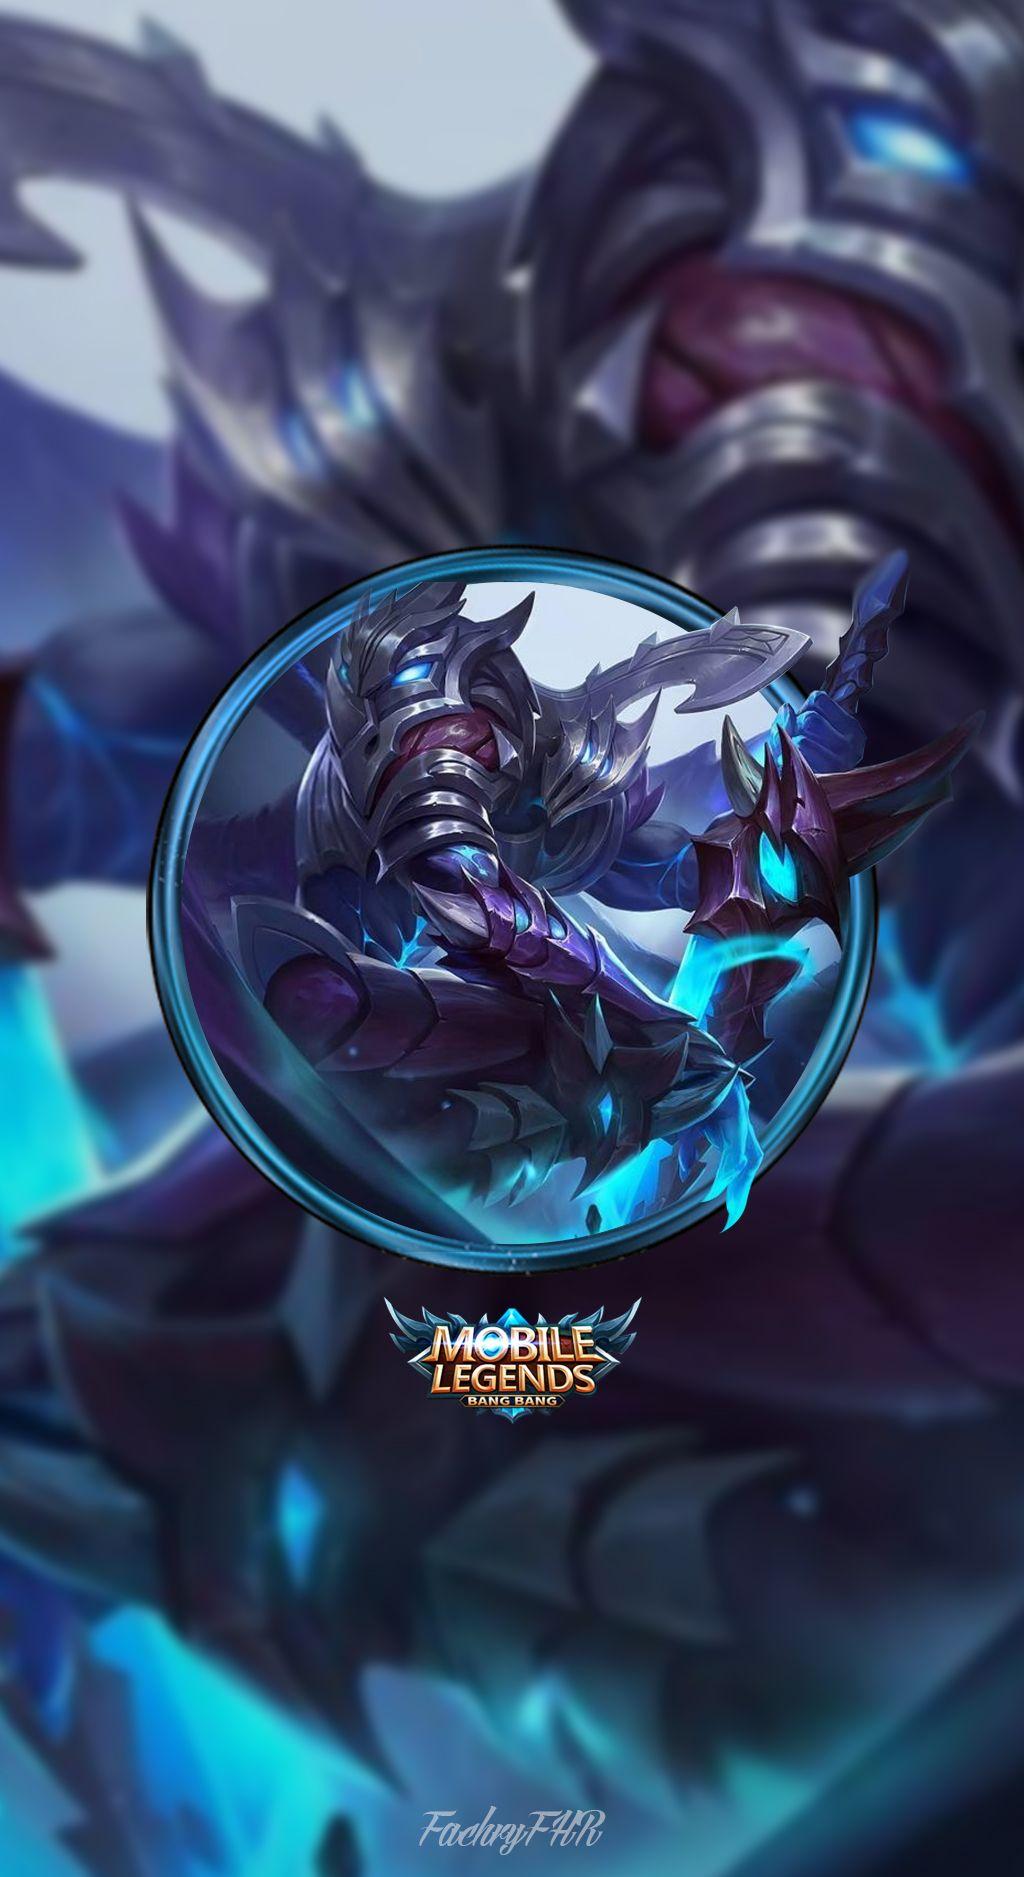 Argus MOBILE LEGENDS  Mobile legend wallpaper, Alucard mobile